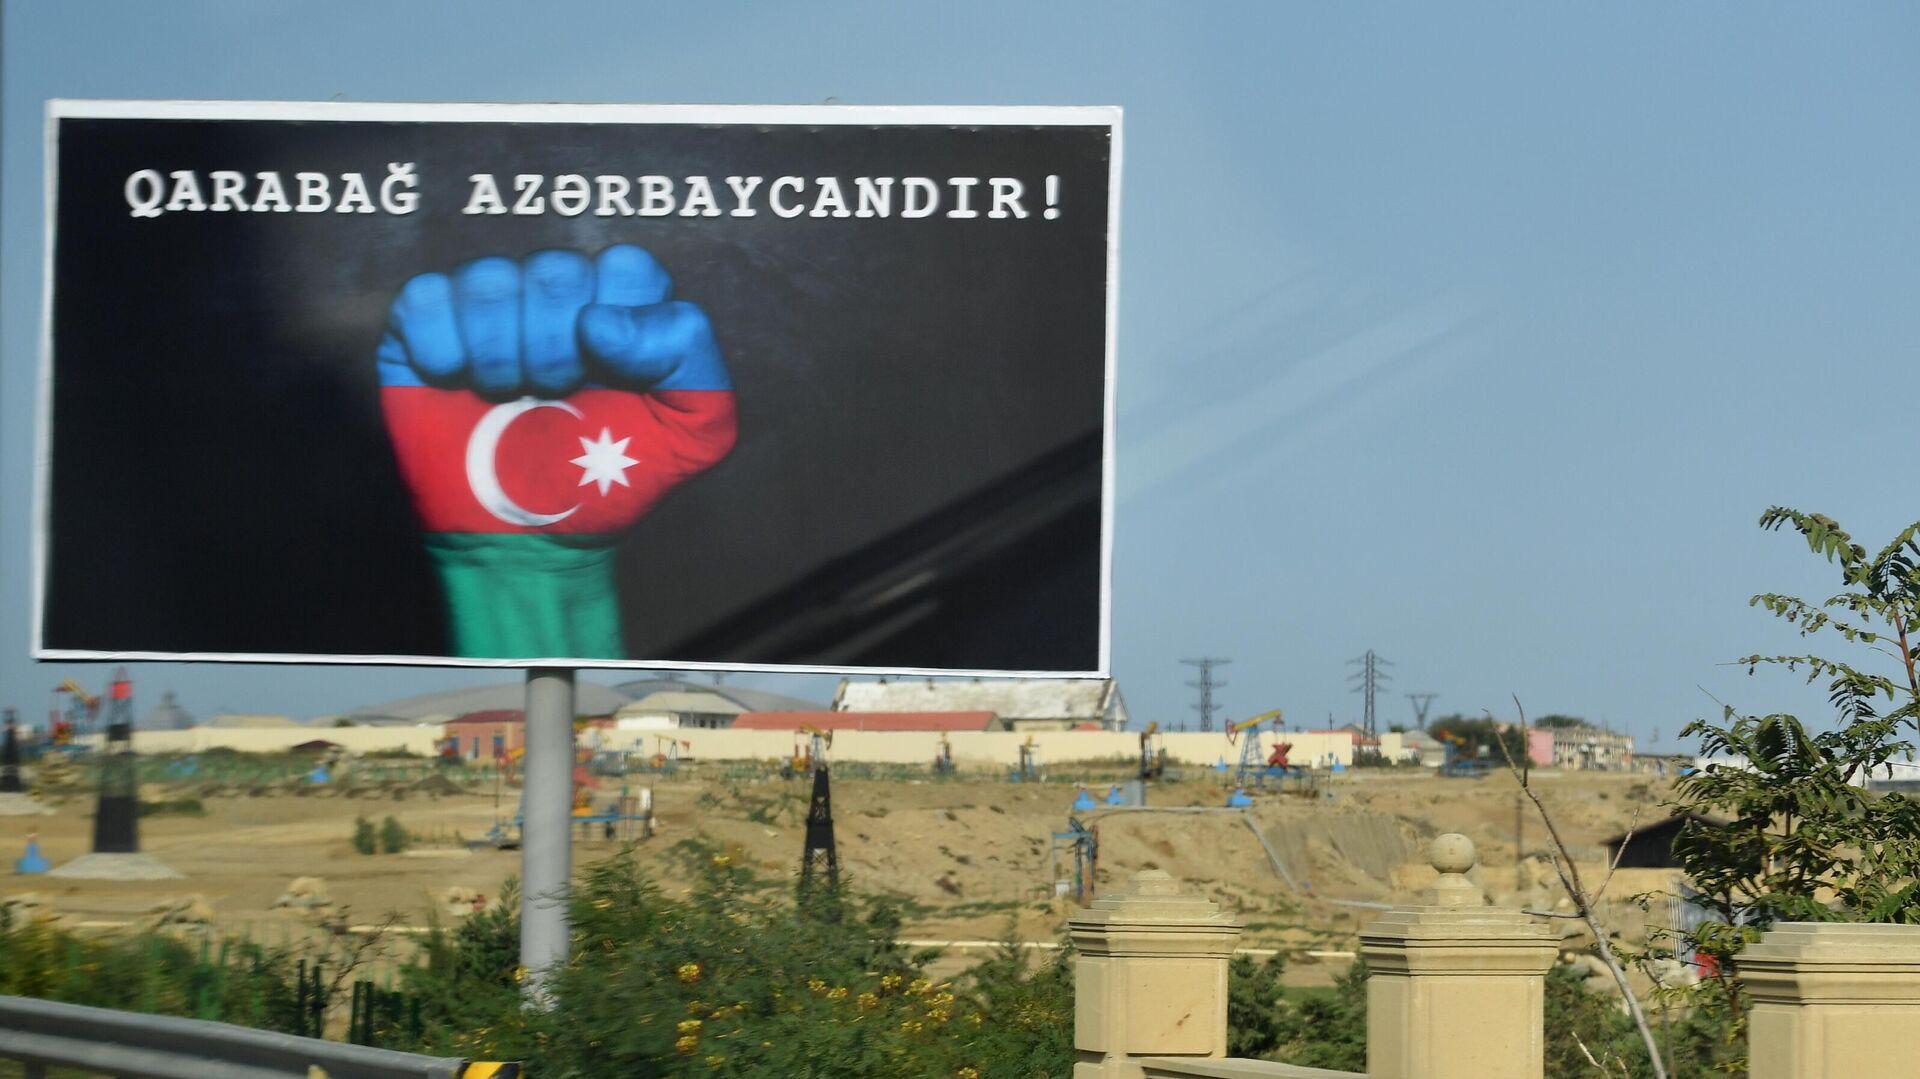 Билборд с надписью Карабах Азербайджана в Баку - РИА Новости, 1920, 16.10.2020